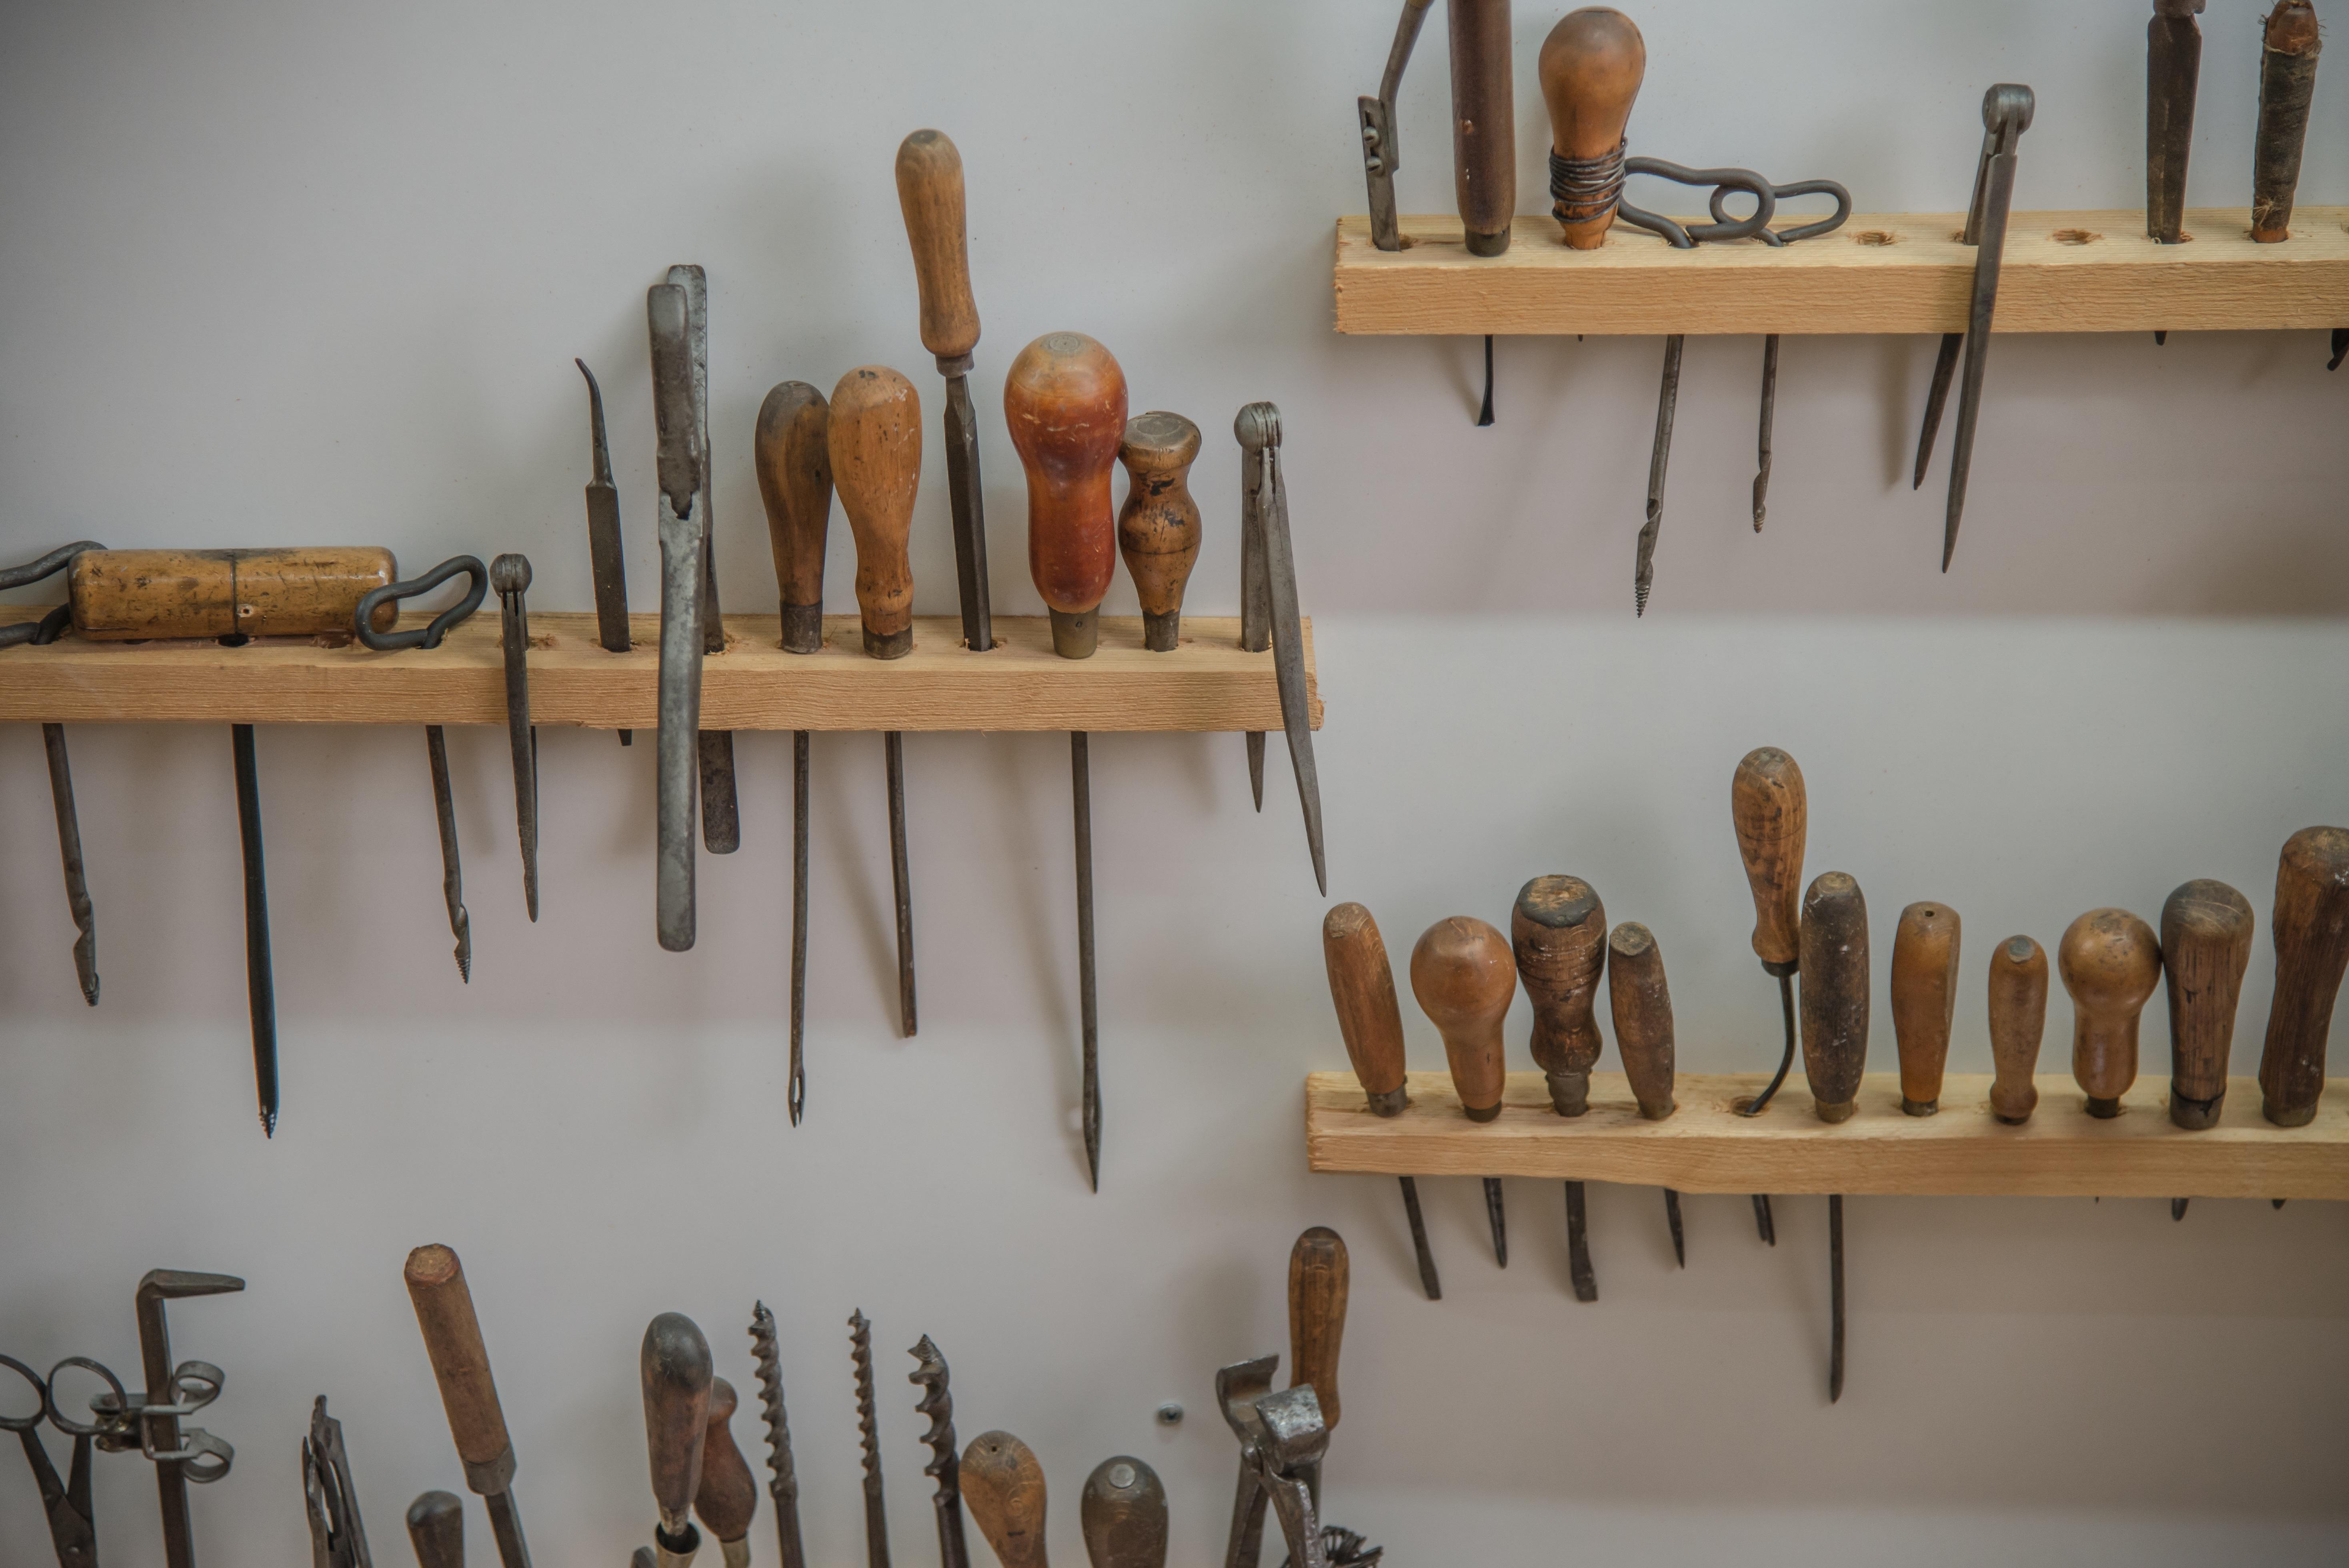 Fotos gratis madera antiguo retro herramienta - Reparar muebles antiguos ...